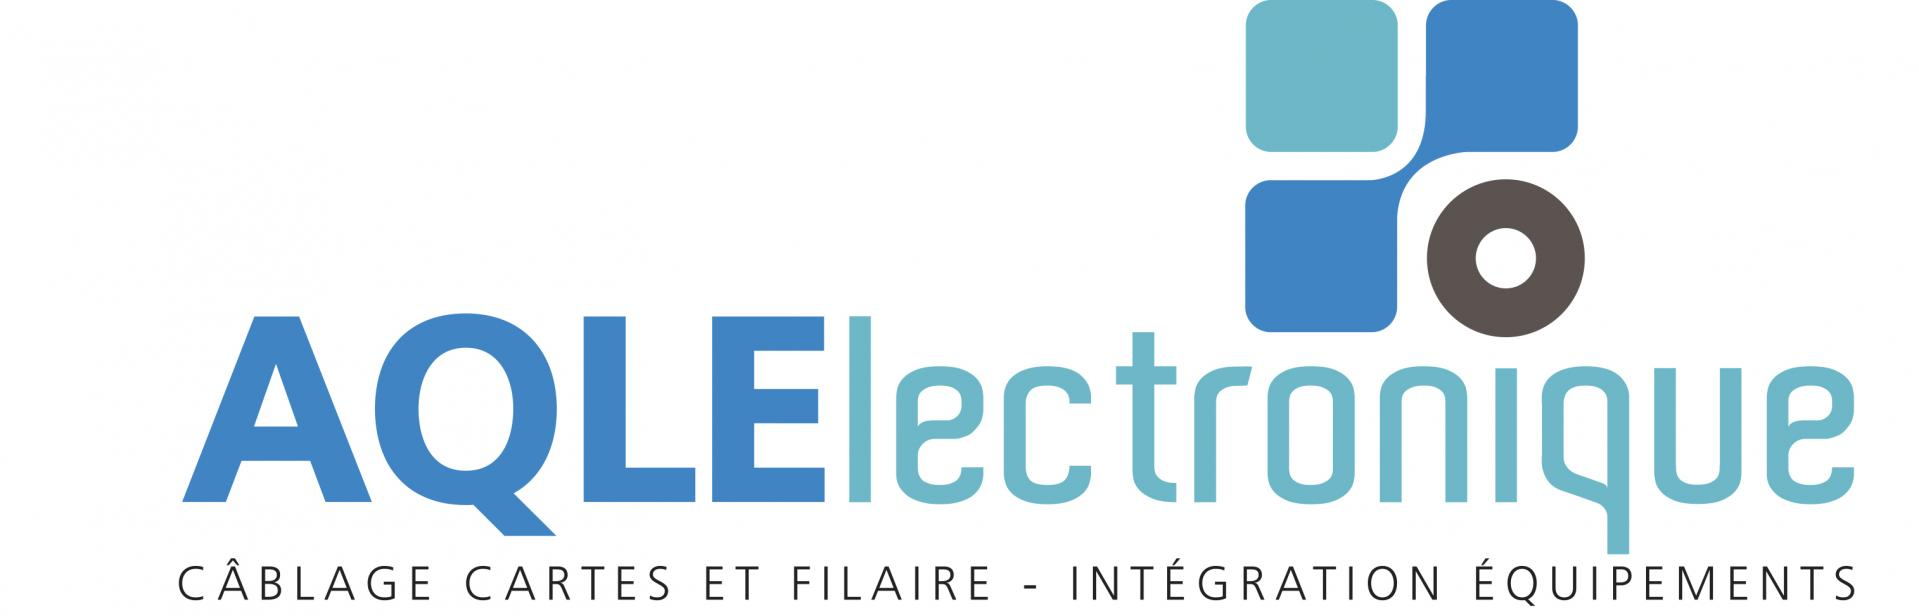 Logo aqle vectorise